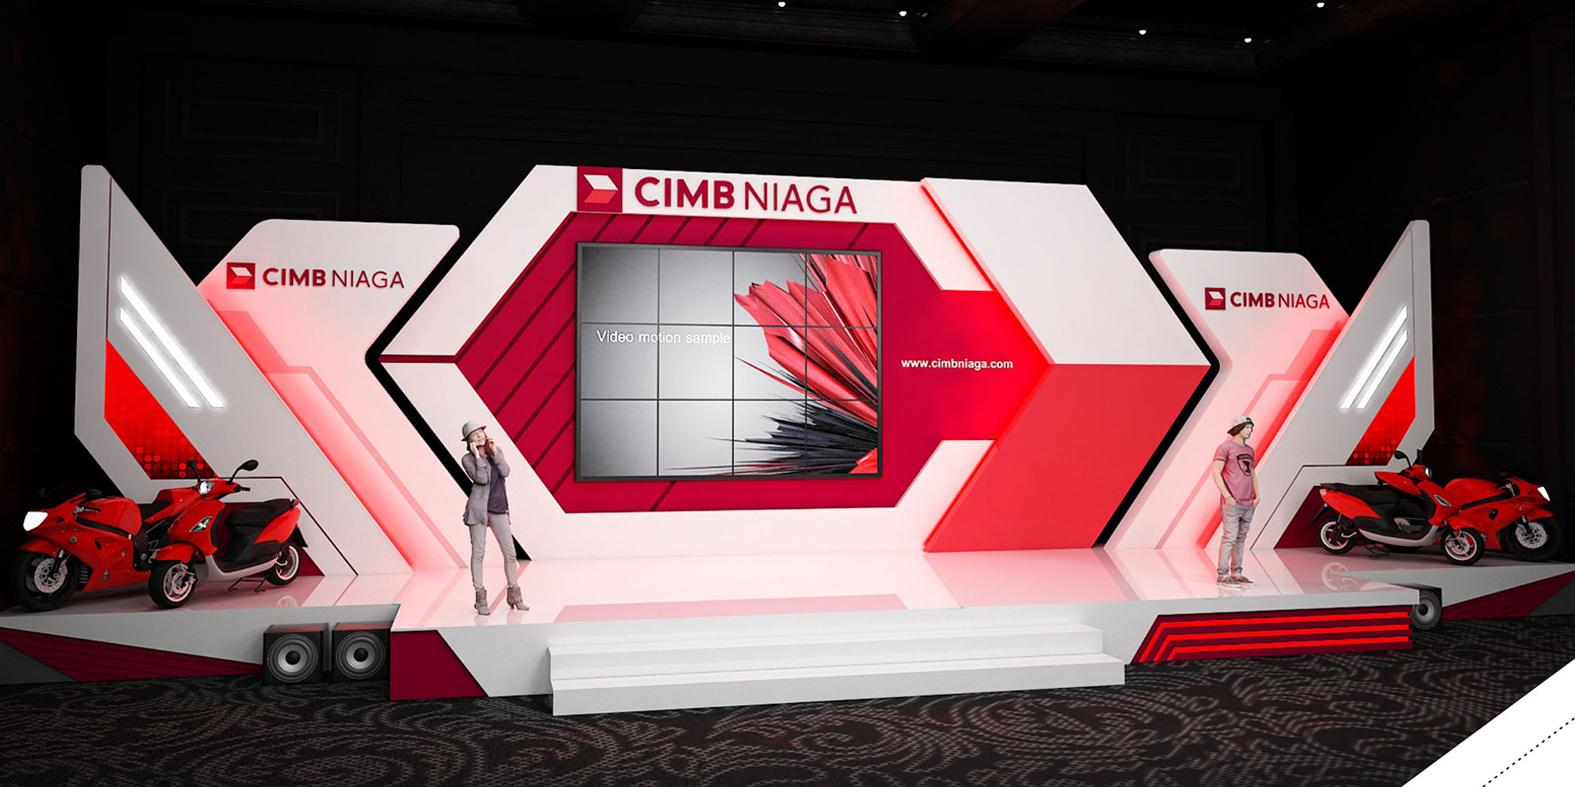 Design Stage Bank CIMB NIAGA